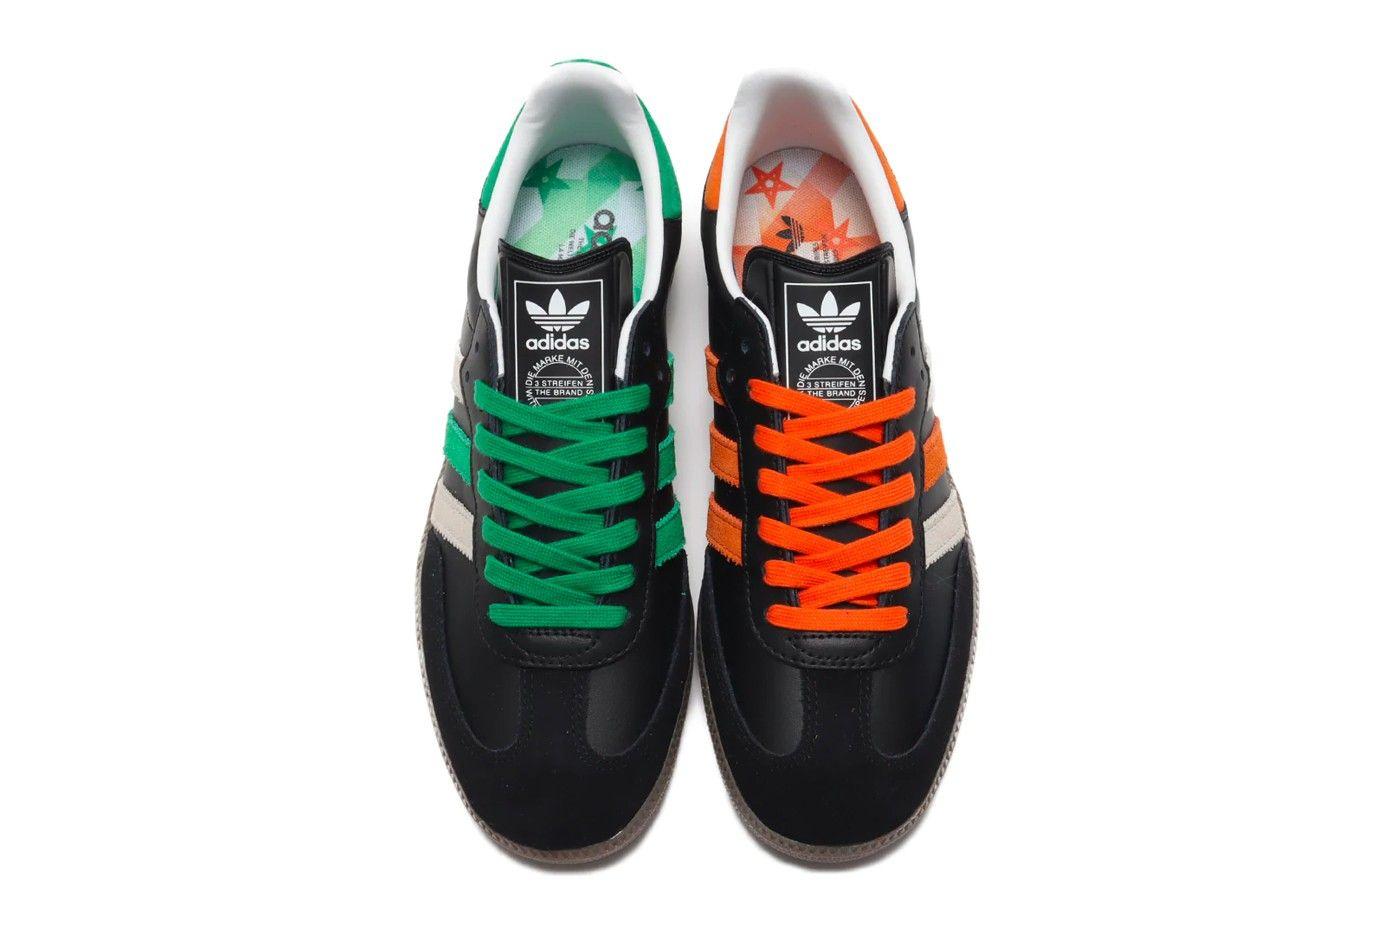 adidas Samba Mismatched Top